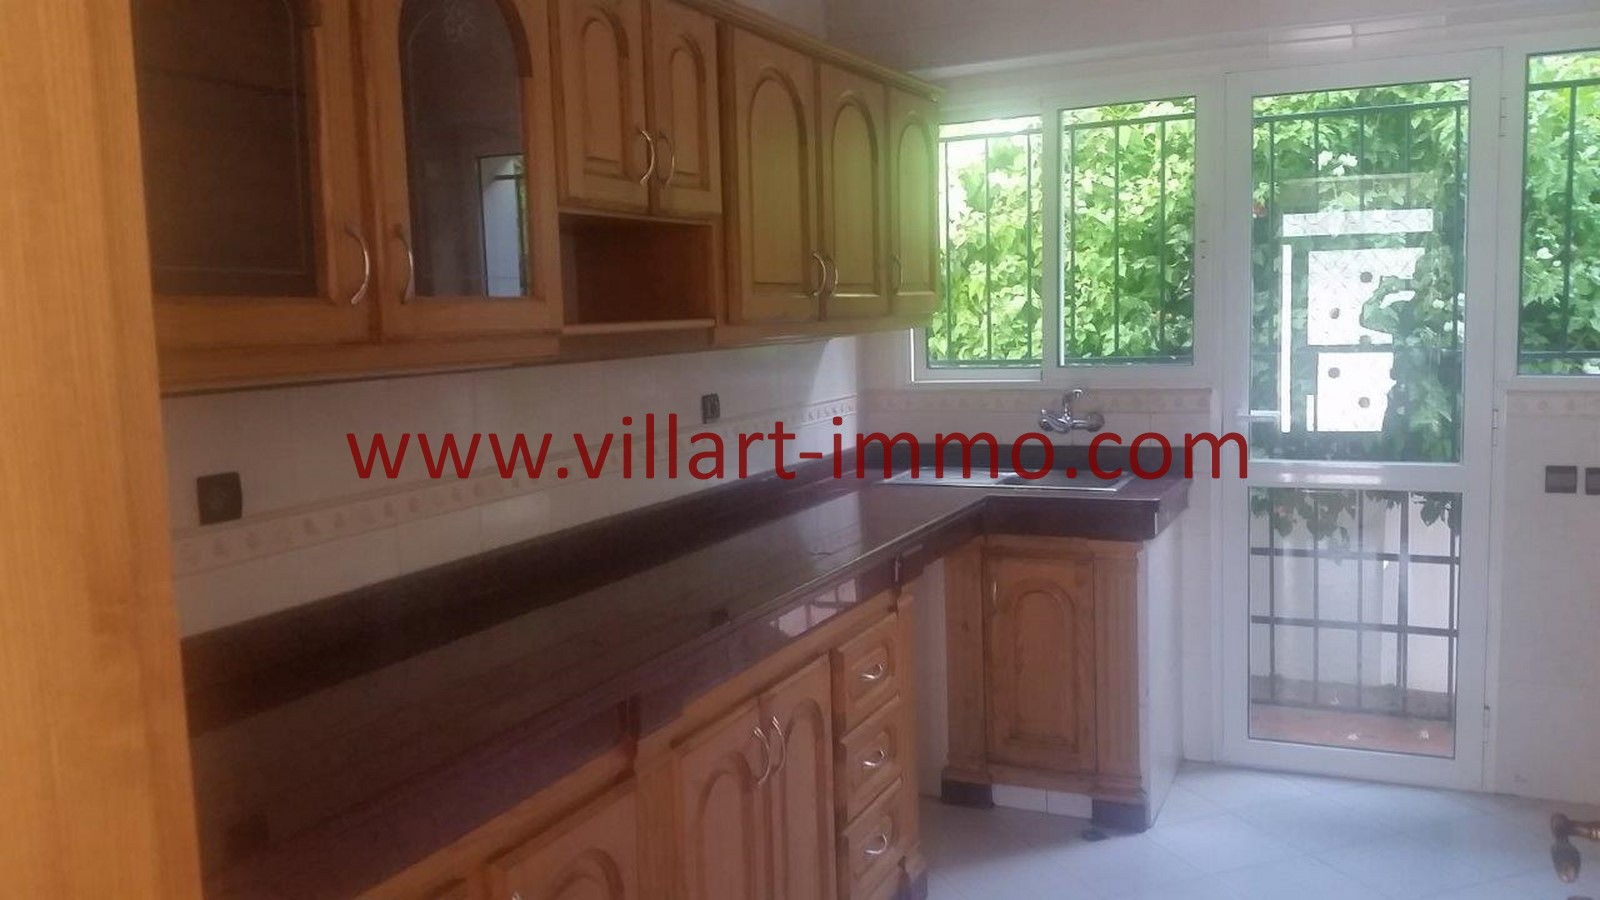 8-a-louer-villa-non-meuble-tanger-cuisine-lv967-villart-immo